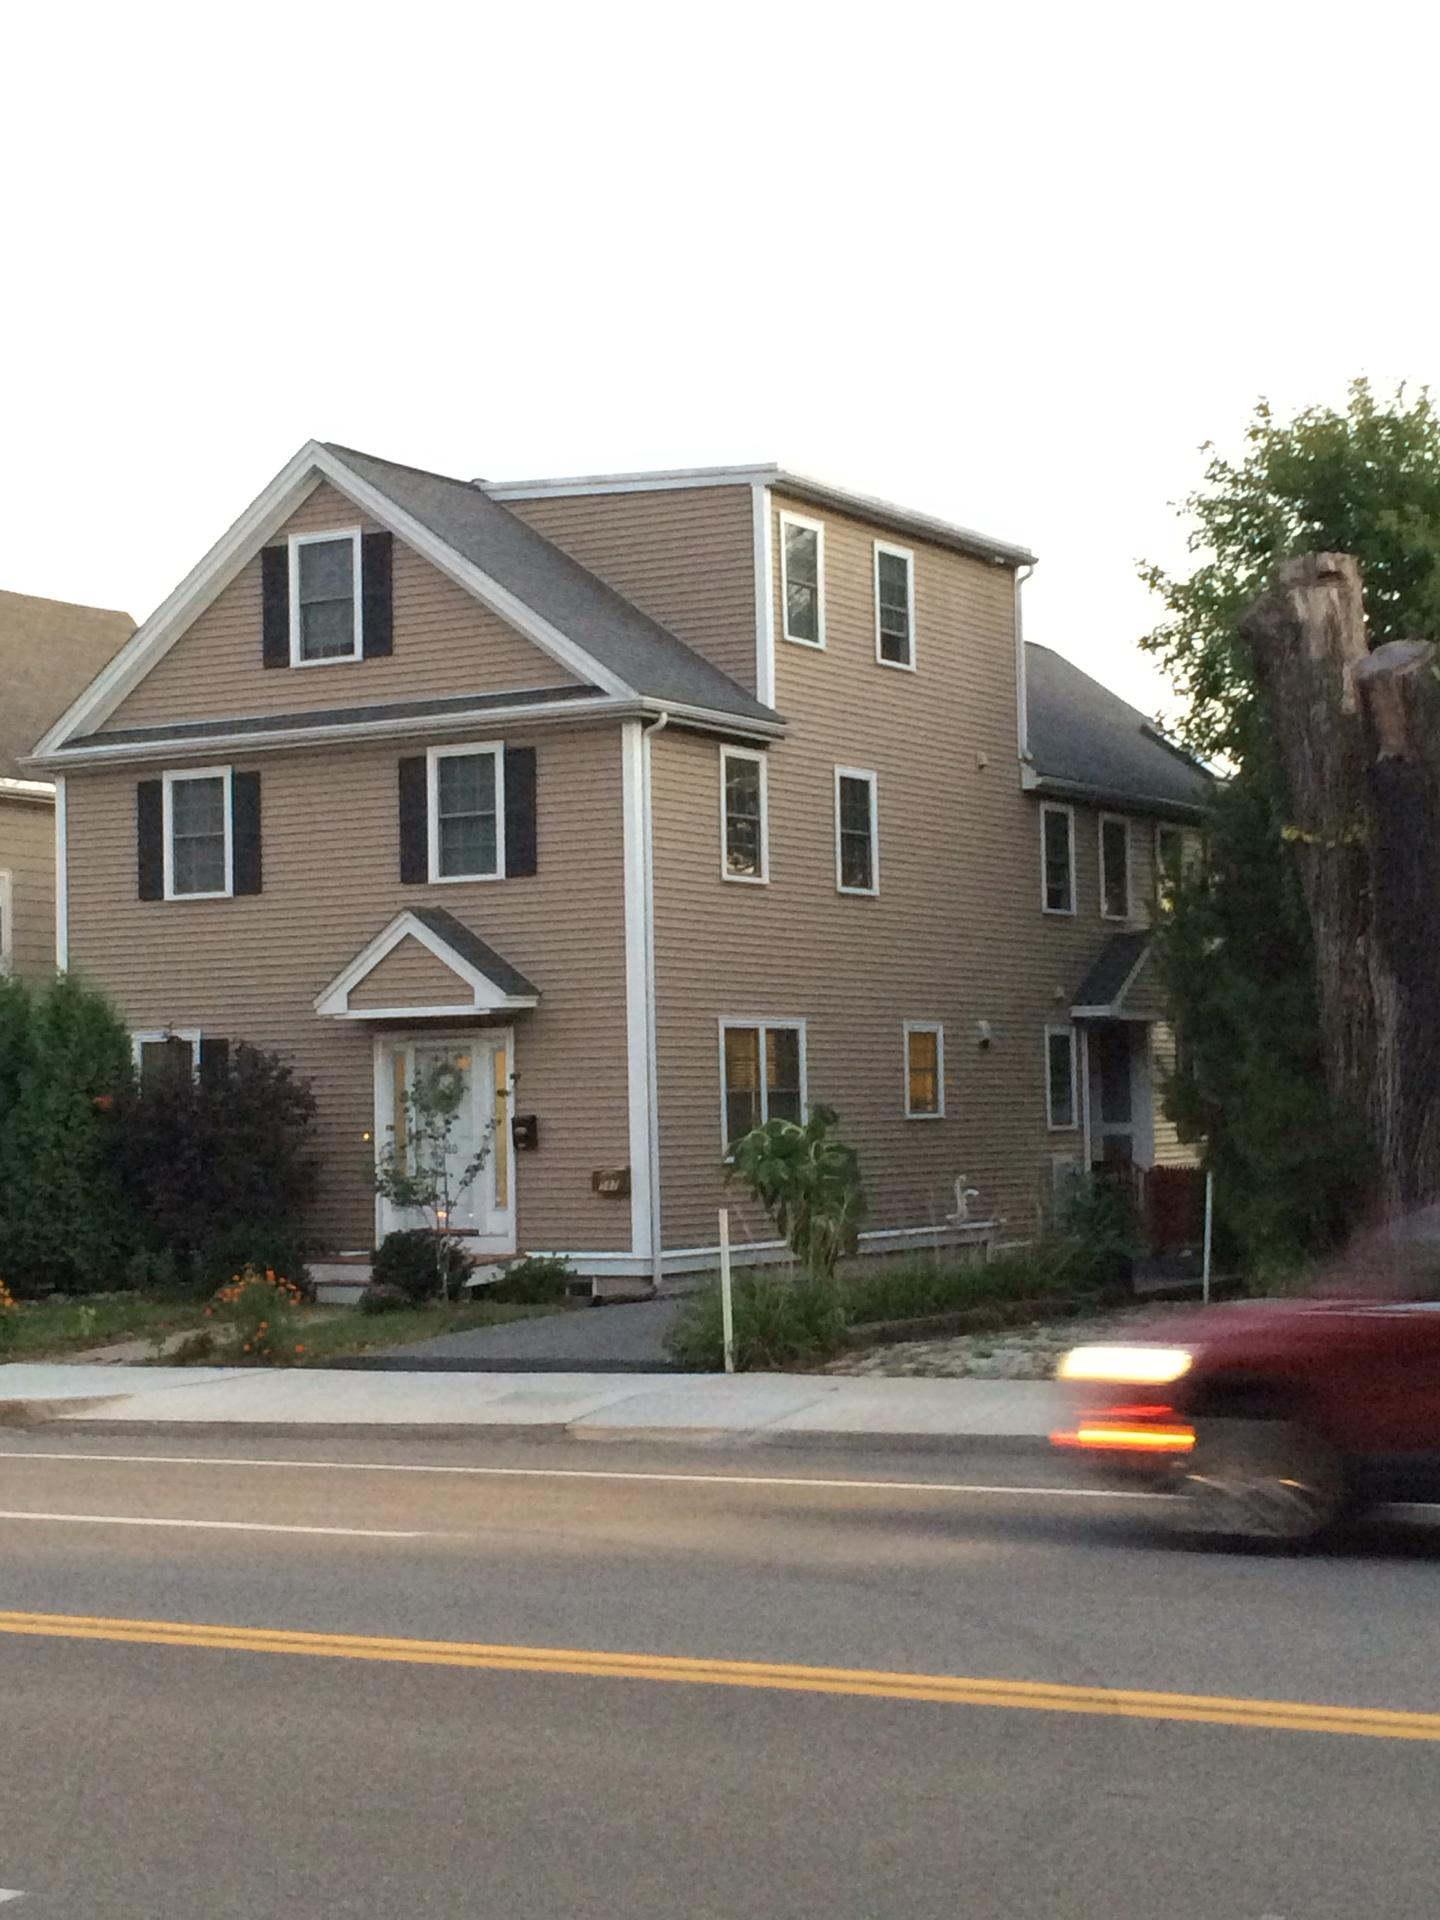 Дом в Бостоне через Airbnb